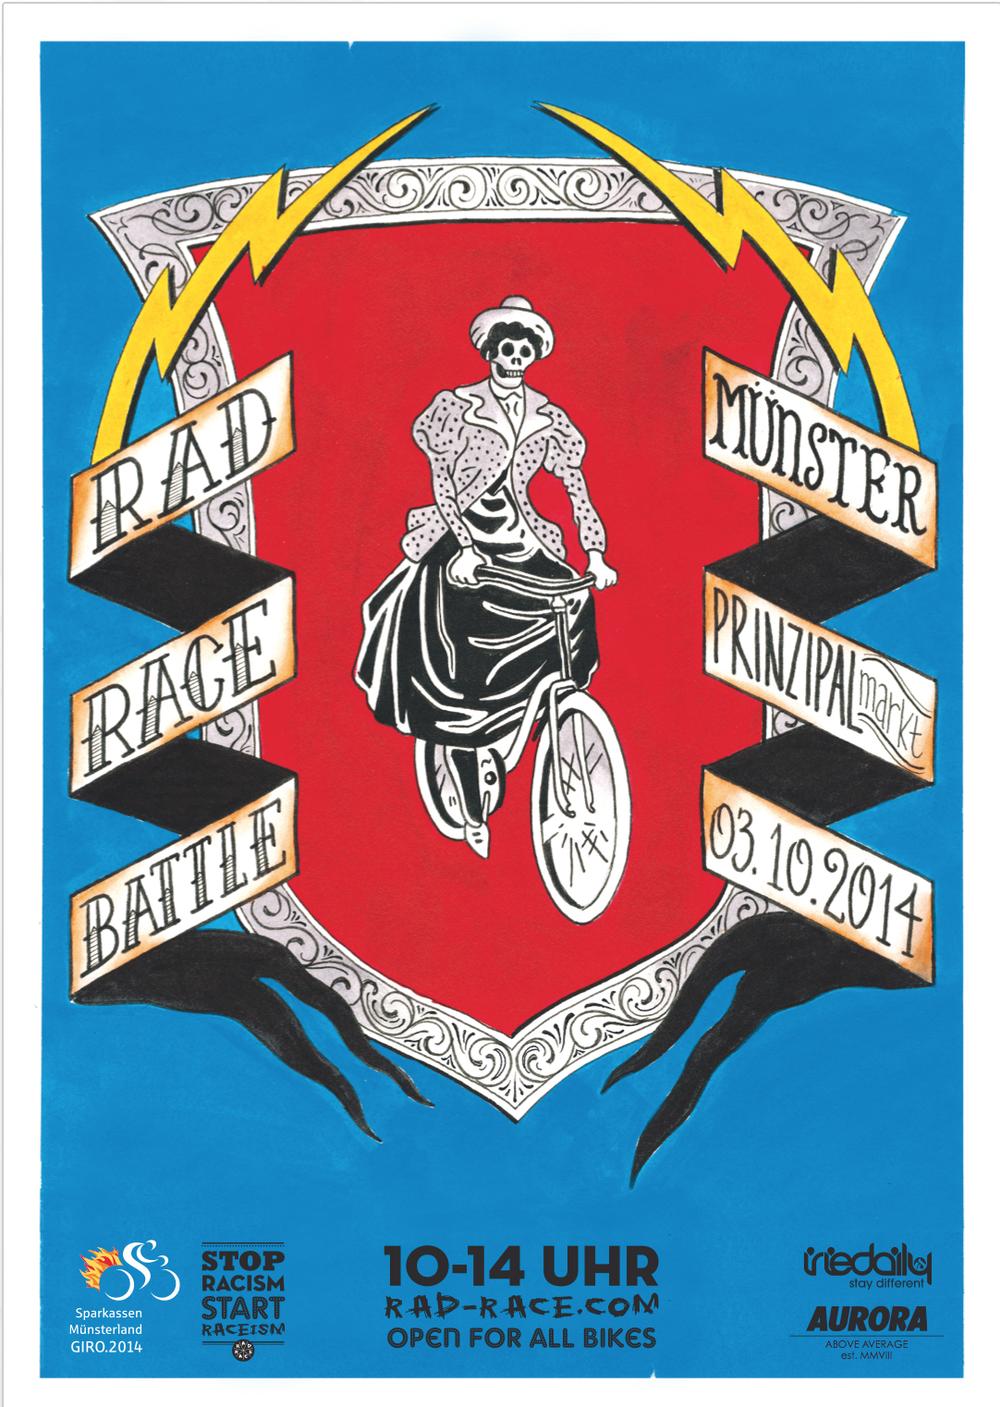 The official Poster hand drawn by Till Pulpanek //https://www.facebook.com/pages/Till-Pulpanek/429935717057099